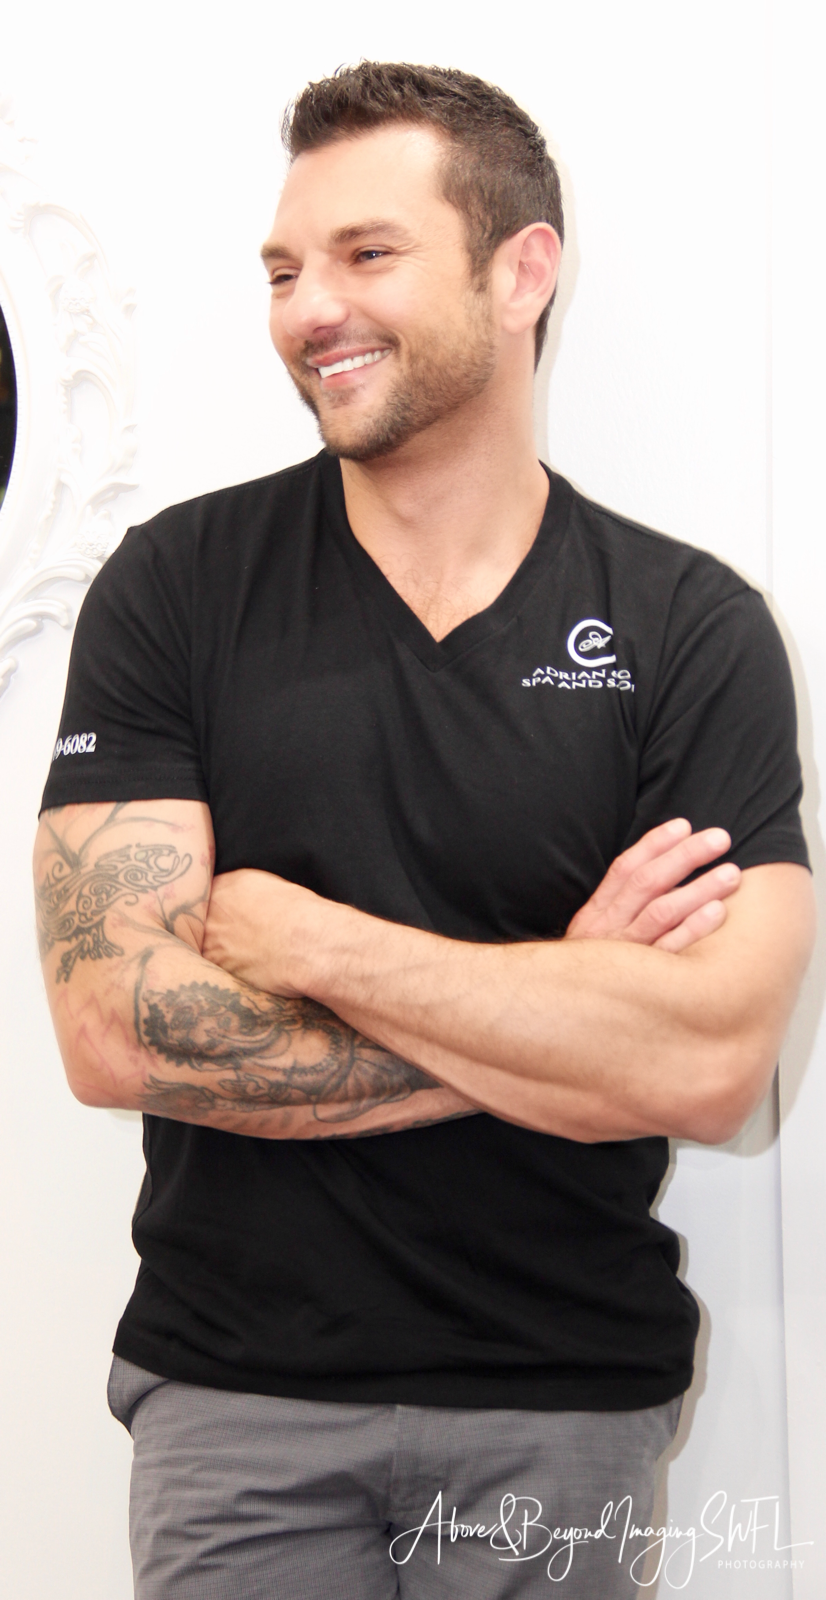 Adrian Kastner - Founder